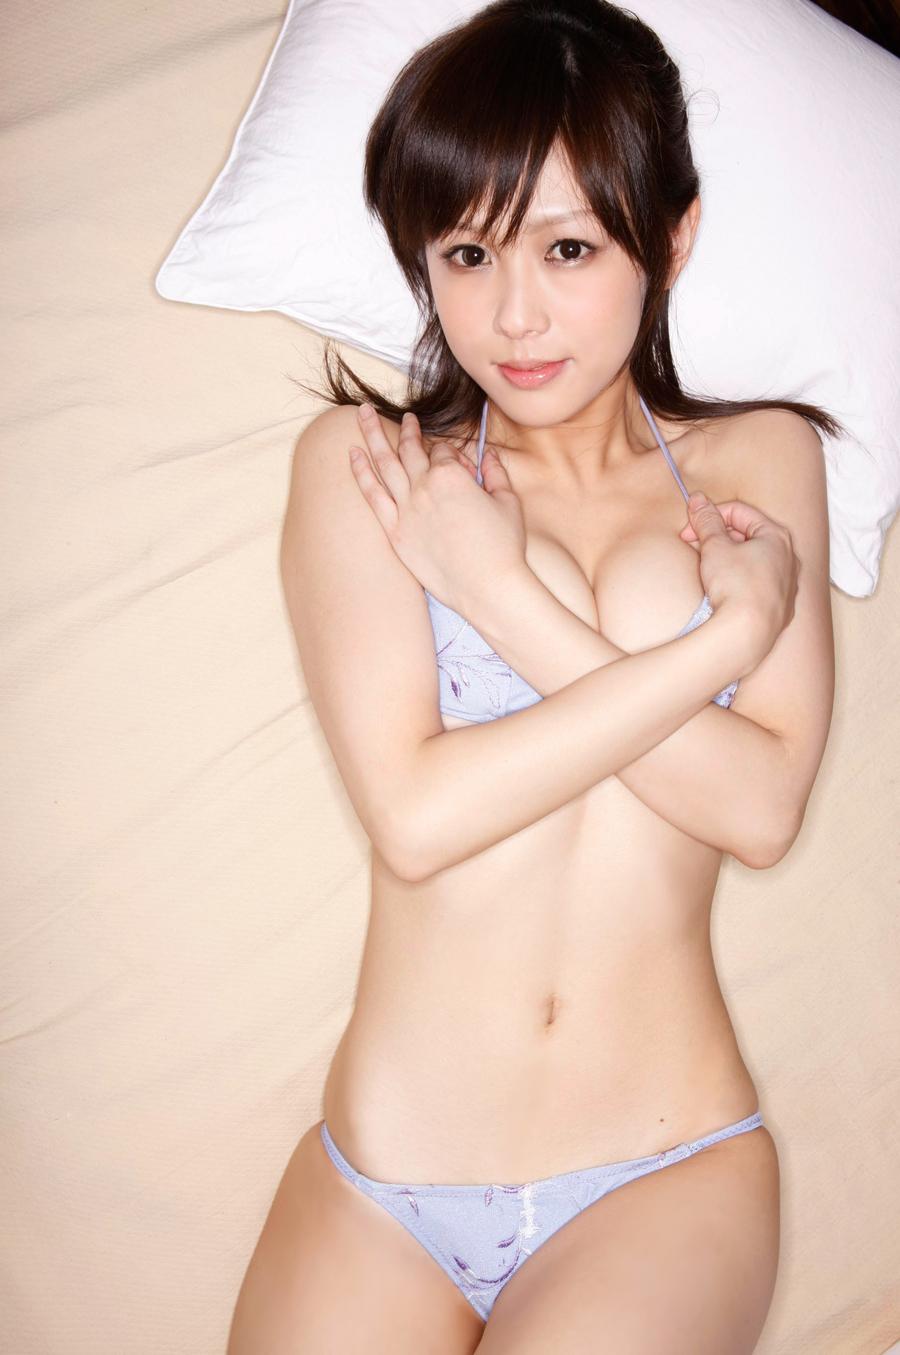 [Princess Collection] Kyoko Kawai 可愛きょうこ 121-130 [10P28MB]